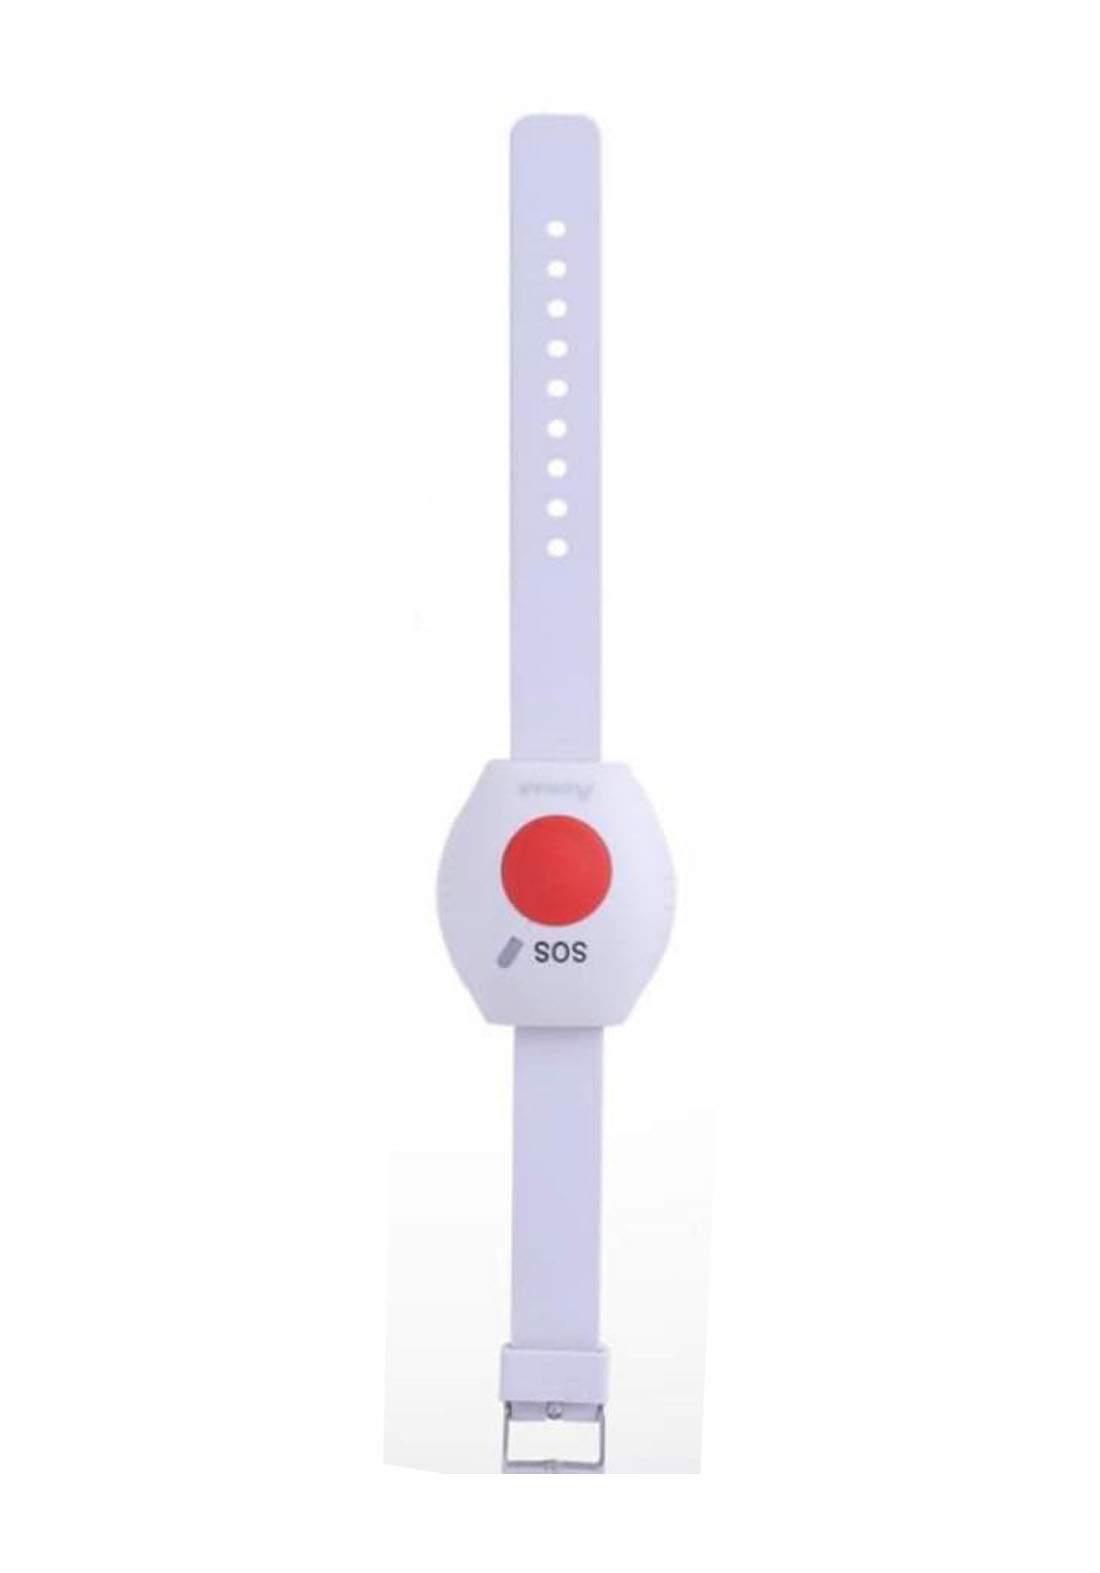 Aswar AS-HSS2-WSOS Emergency alarm Watch - White ساعة تنبيه طوارئ